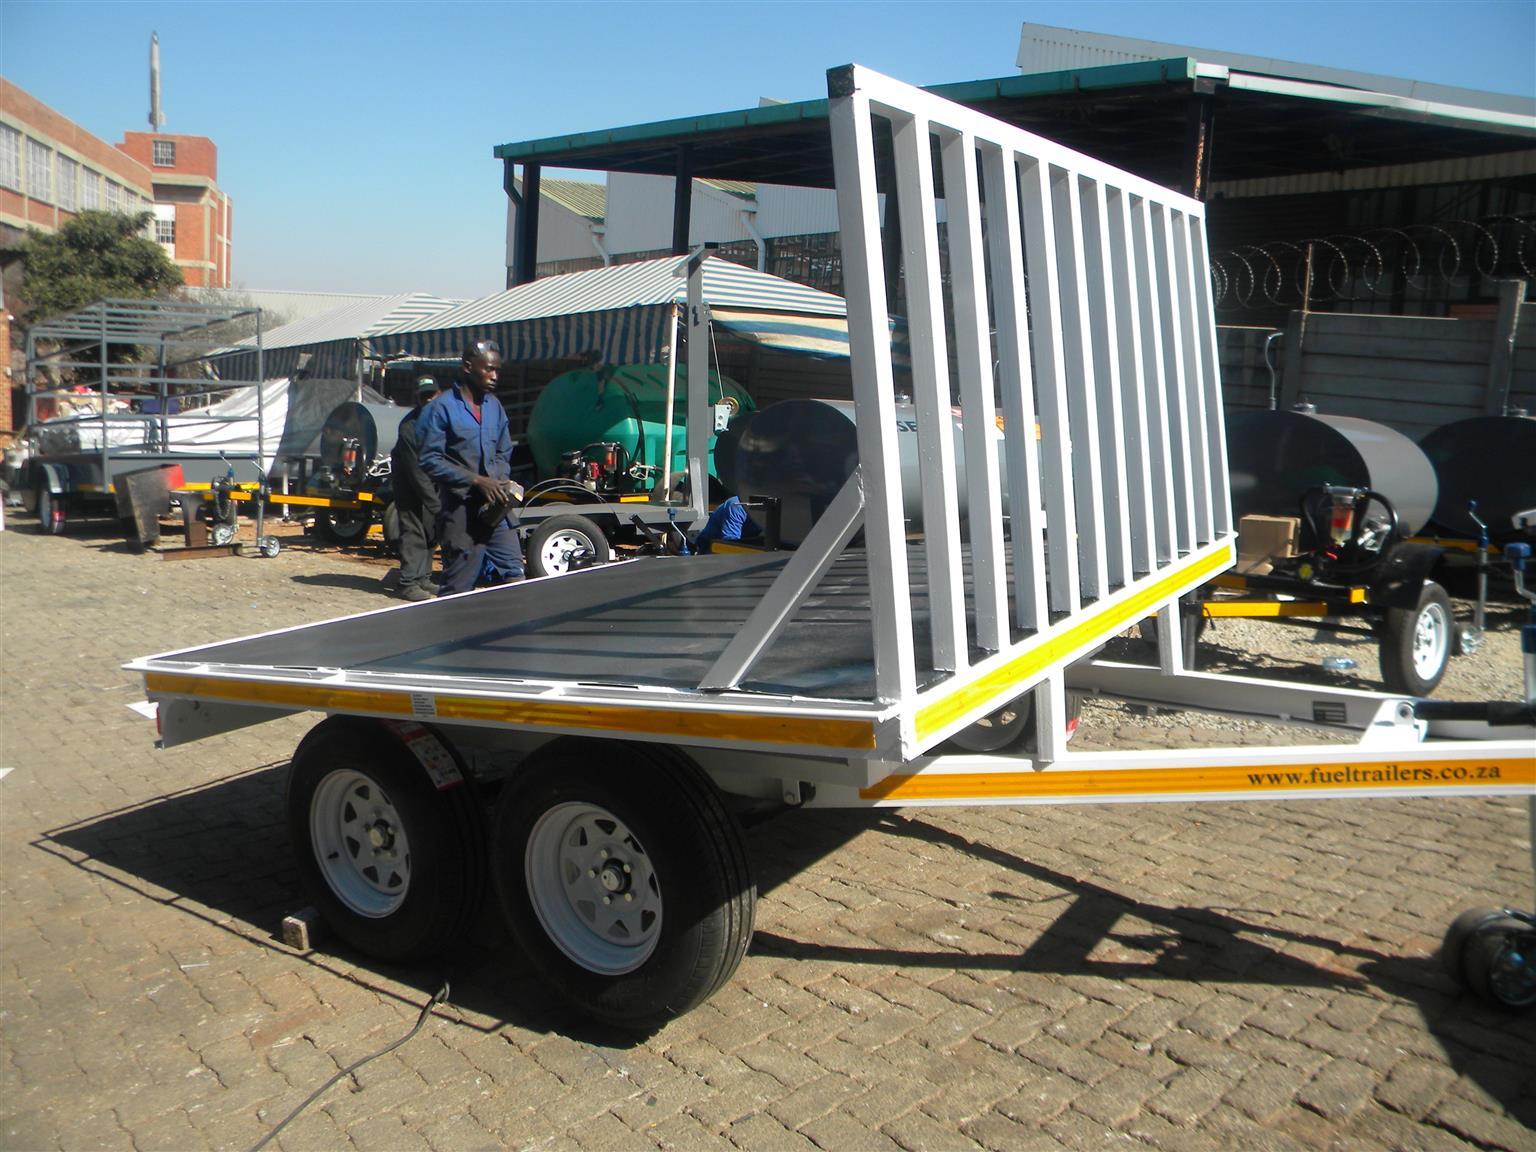 Flat deck trailers